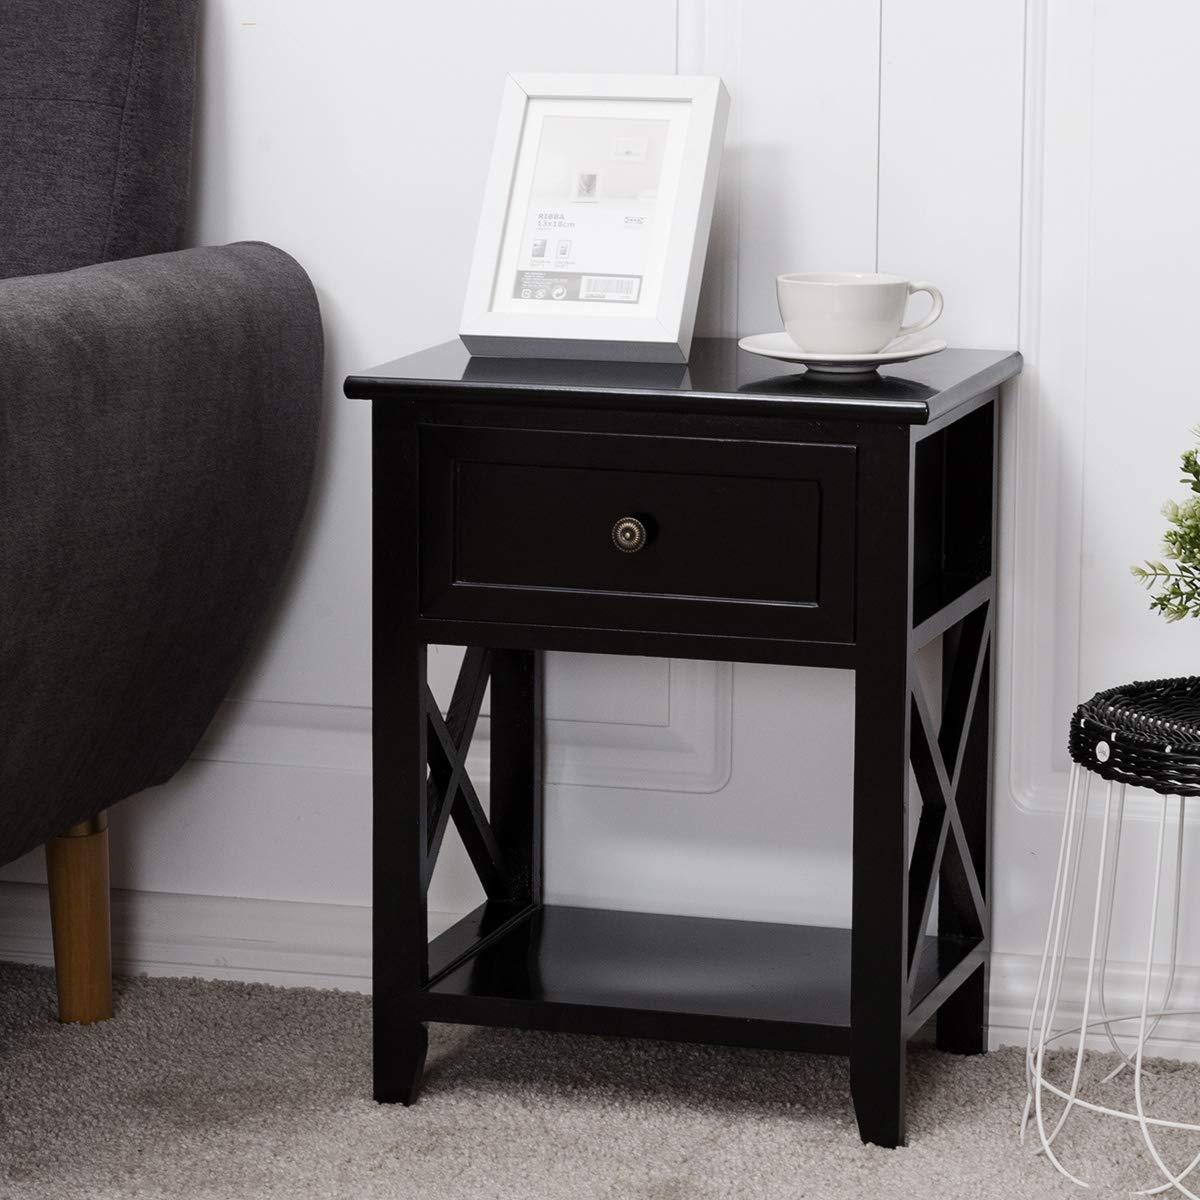 Giantex 2 Pcs Nightstand End Bedside Table Home Bedroom Furniture X-Shape W/Bottom Open Shelf Drawer, Black by Giantex (Image #2)